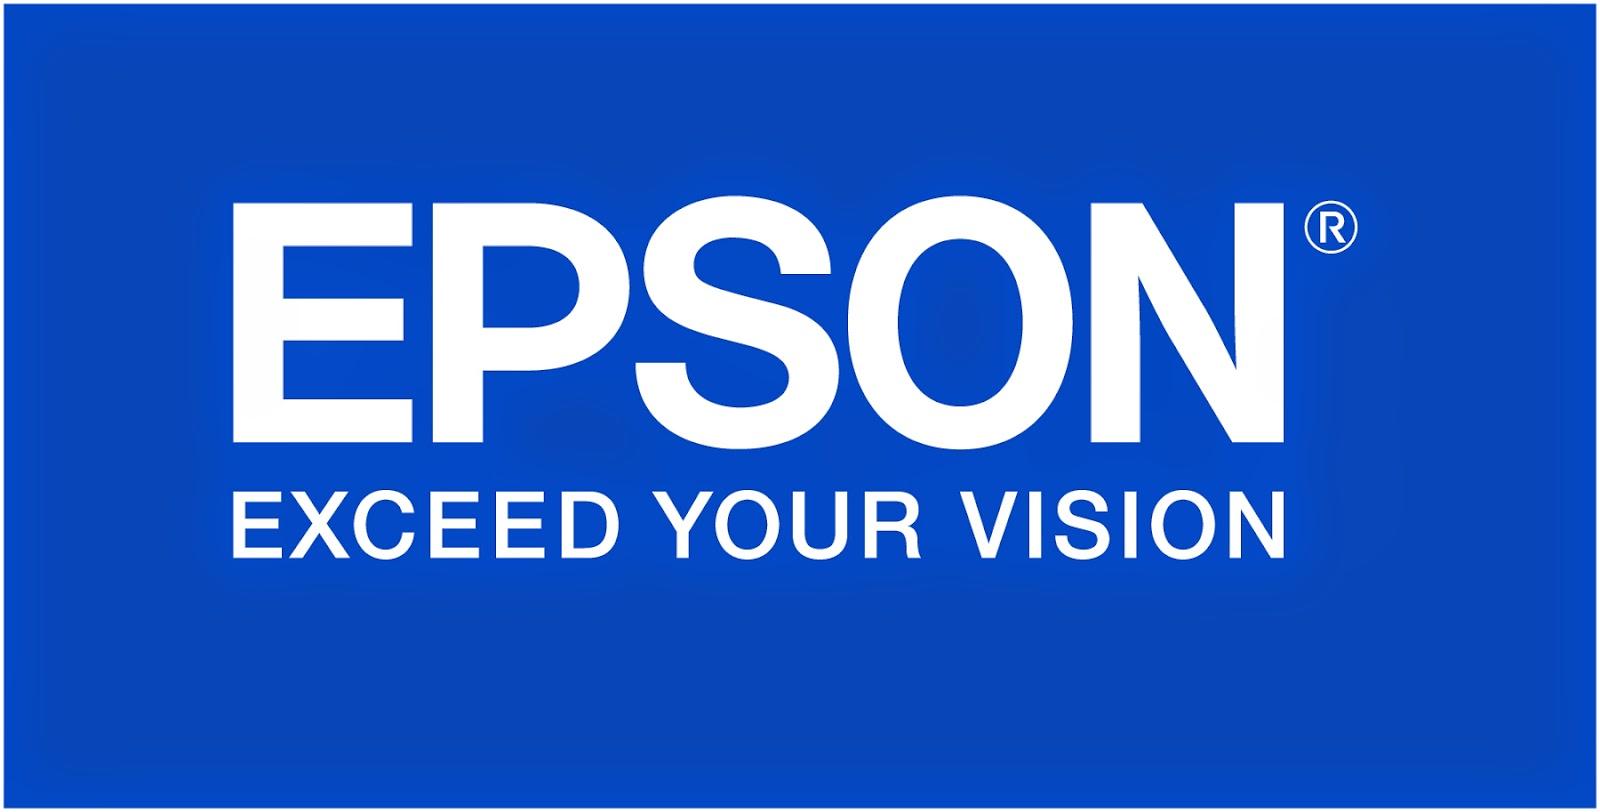 Lowongan Kerja Pabrik Epson Cikarang Bekasi Terbaru Tahun 2021 Roomloker